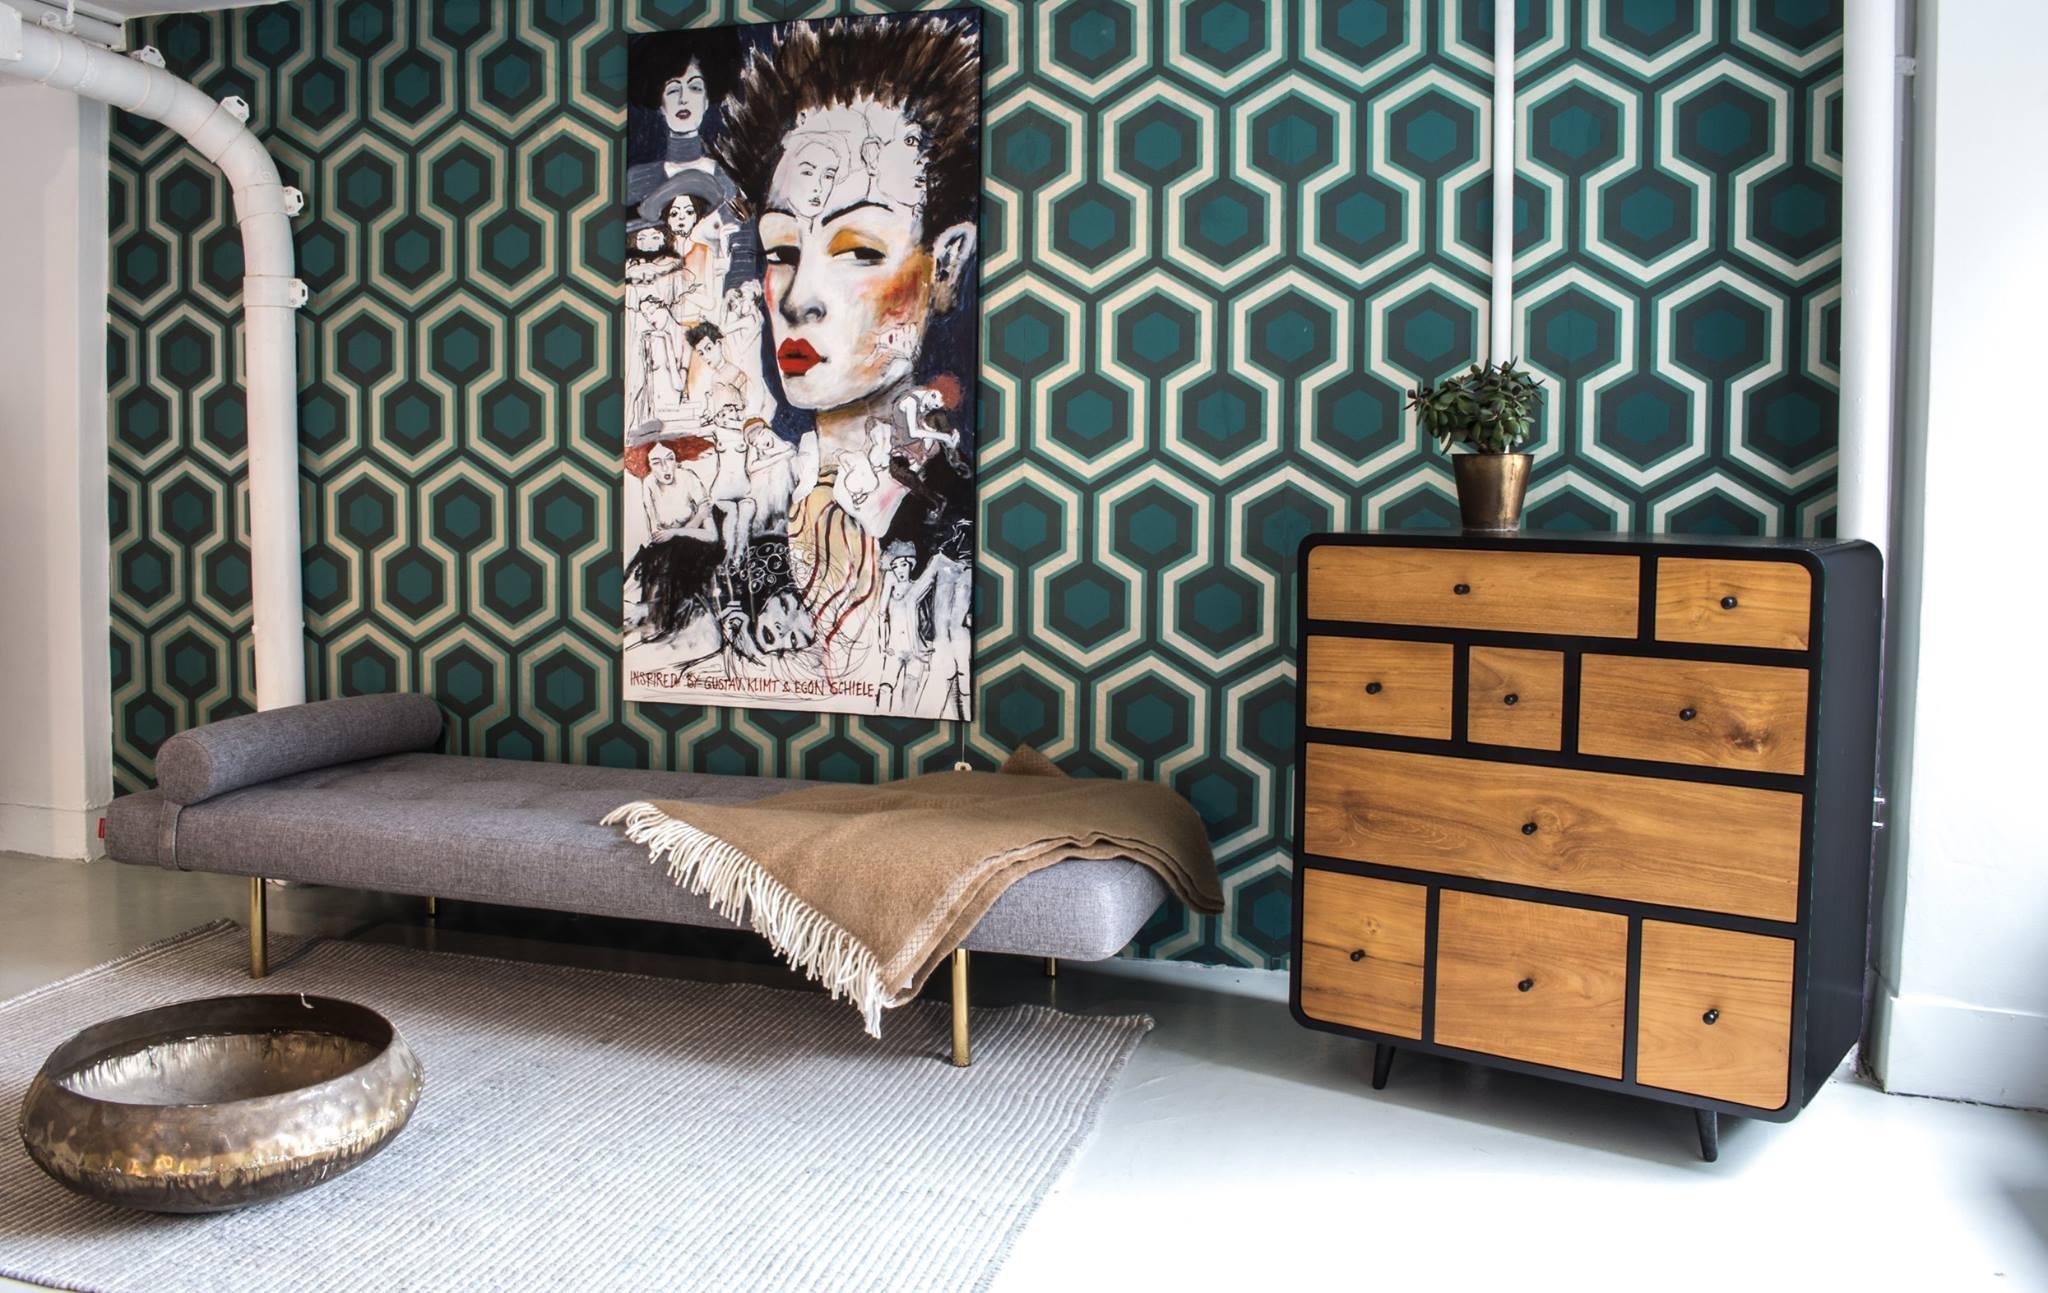 nova møbler Her har Nova Møbler åbsin sjette butik   Wood Supply DK nova møbler